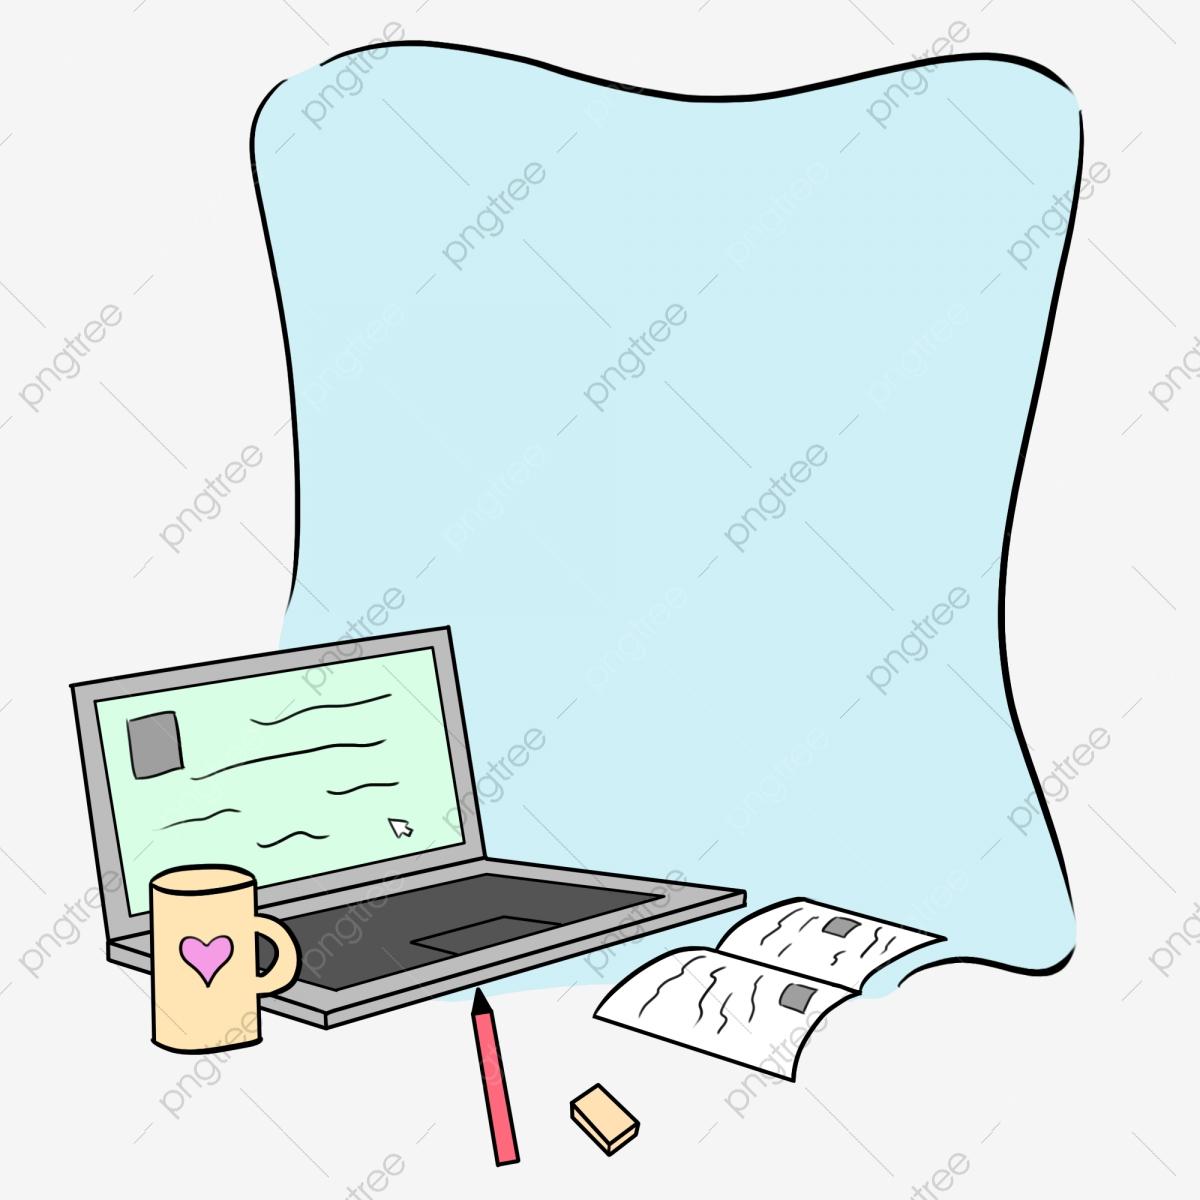 Cartoon Learning Tools Computer Frame, Hand Drawn Illustration.